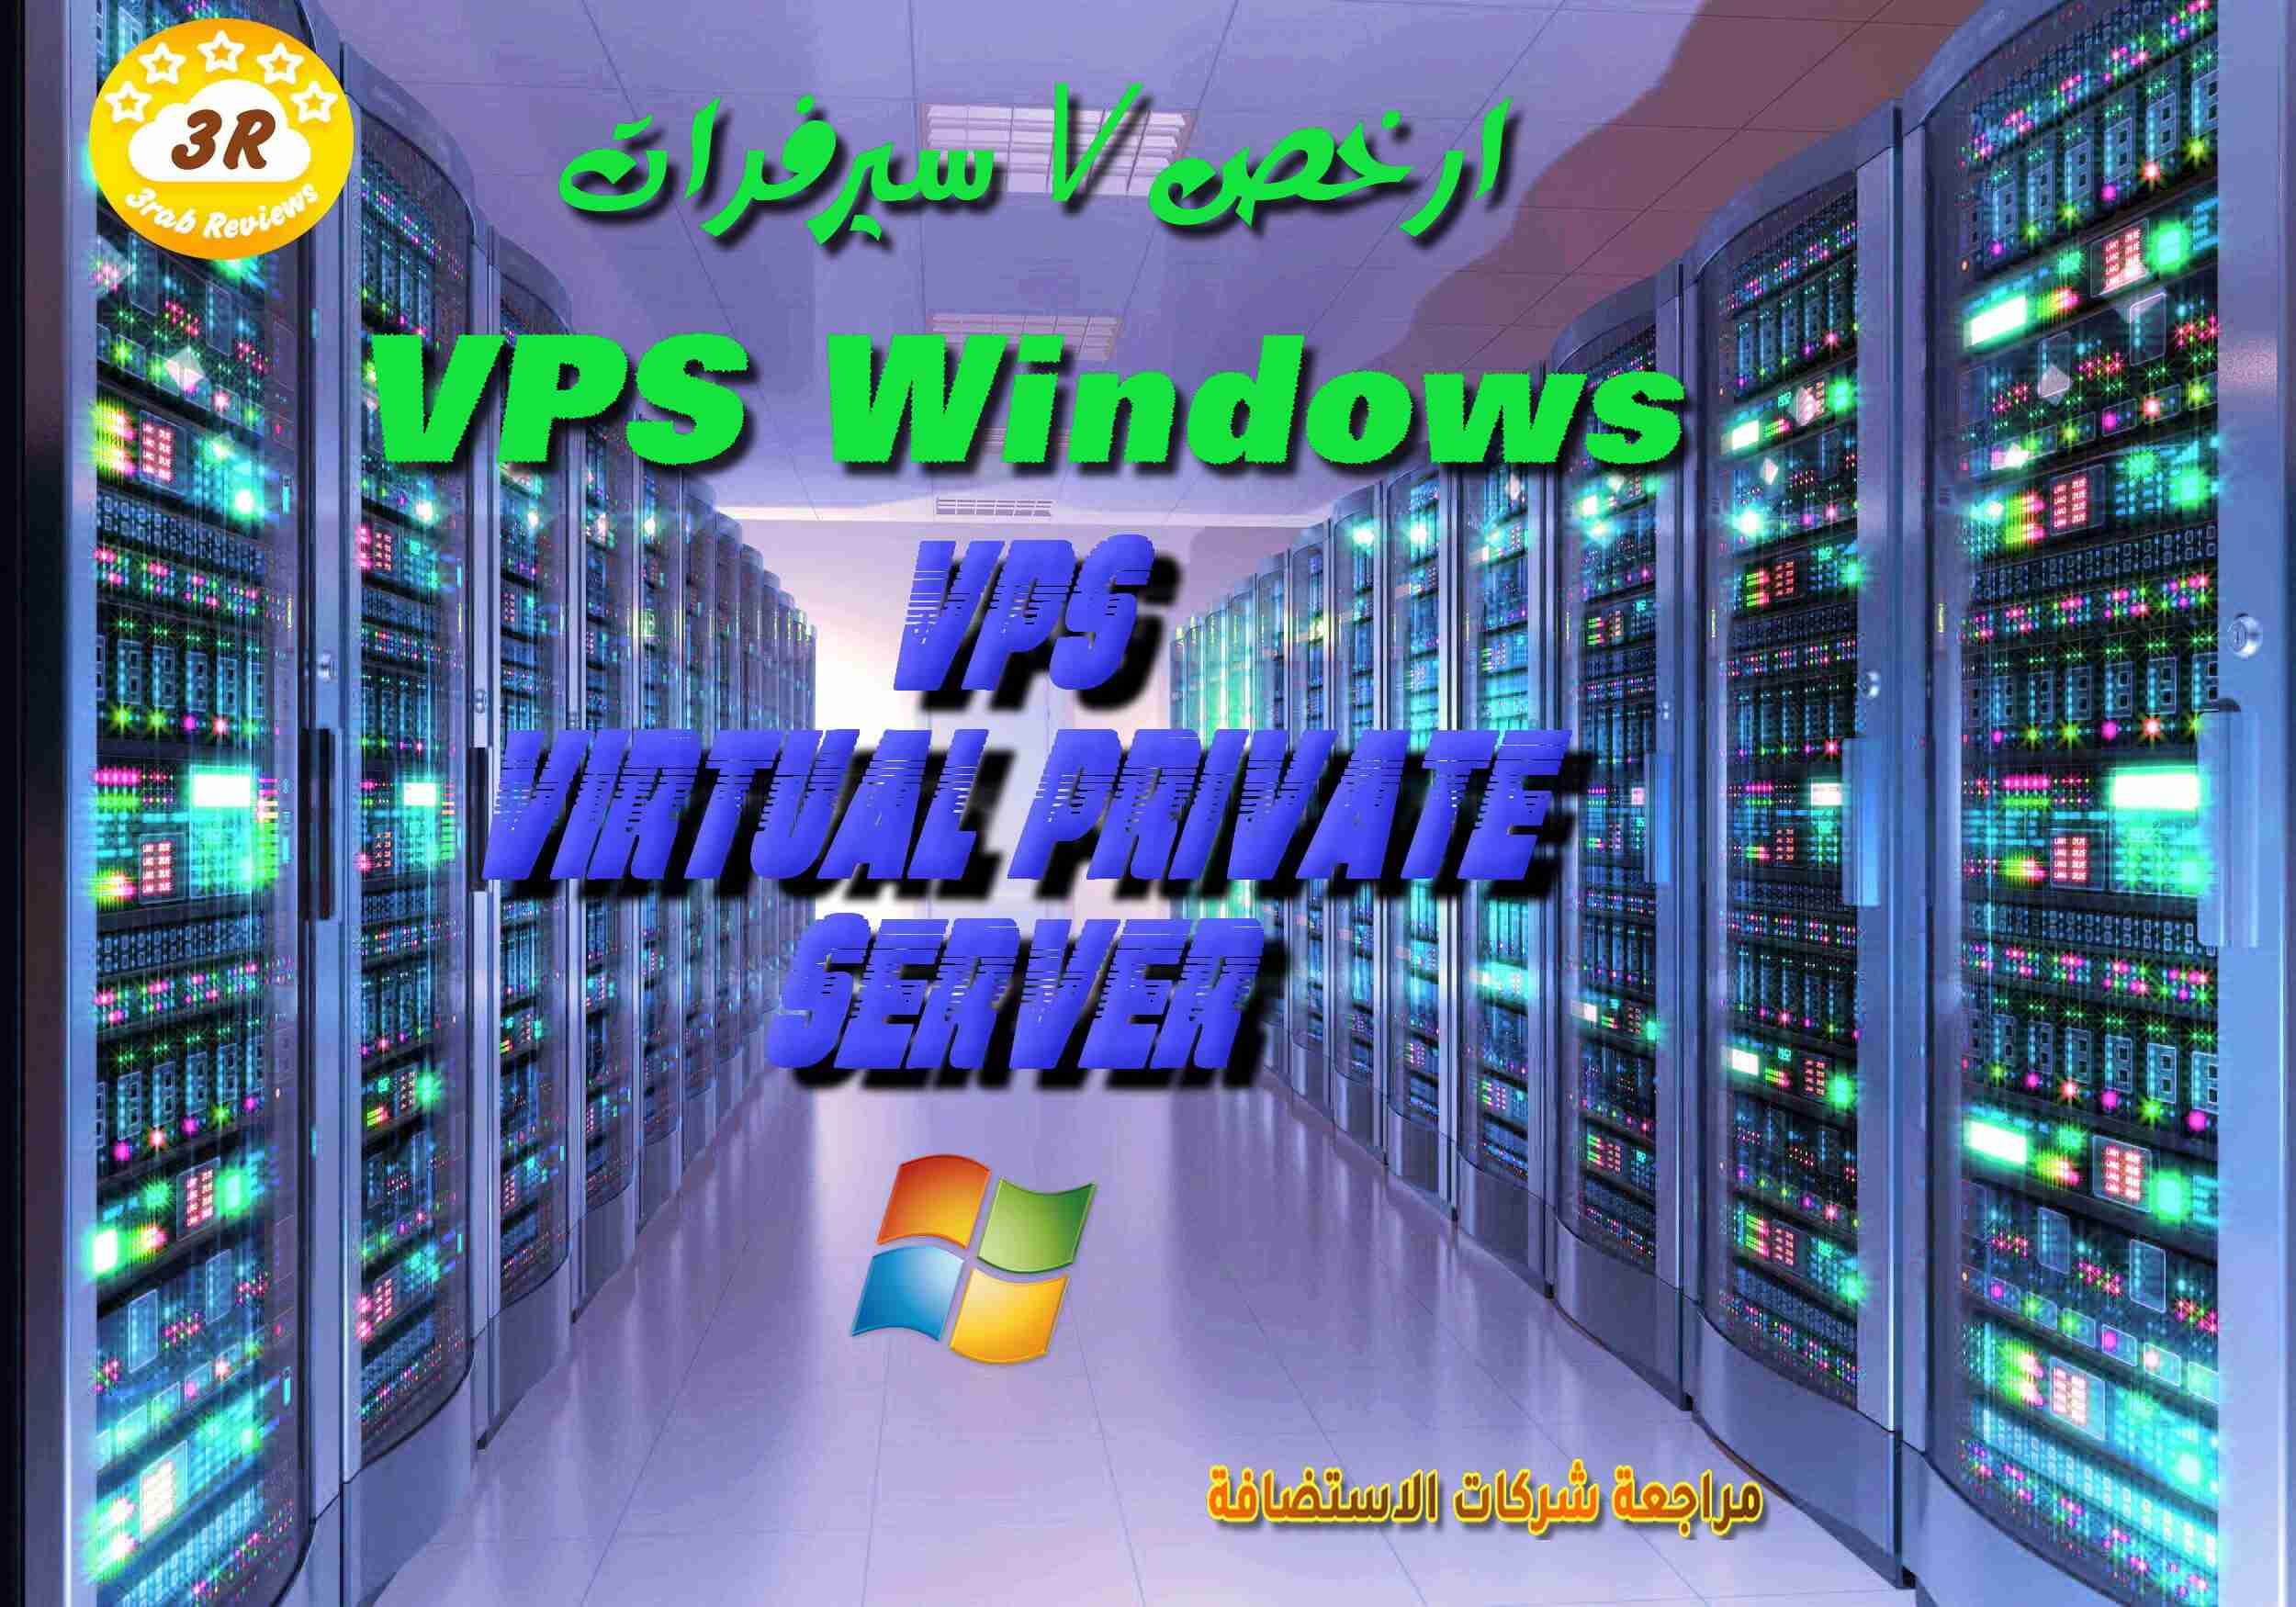 ارخص VPS Windows